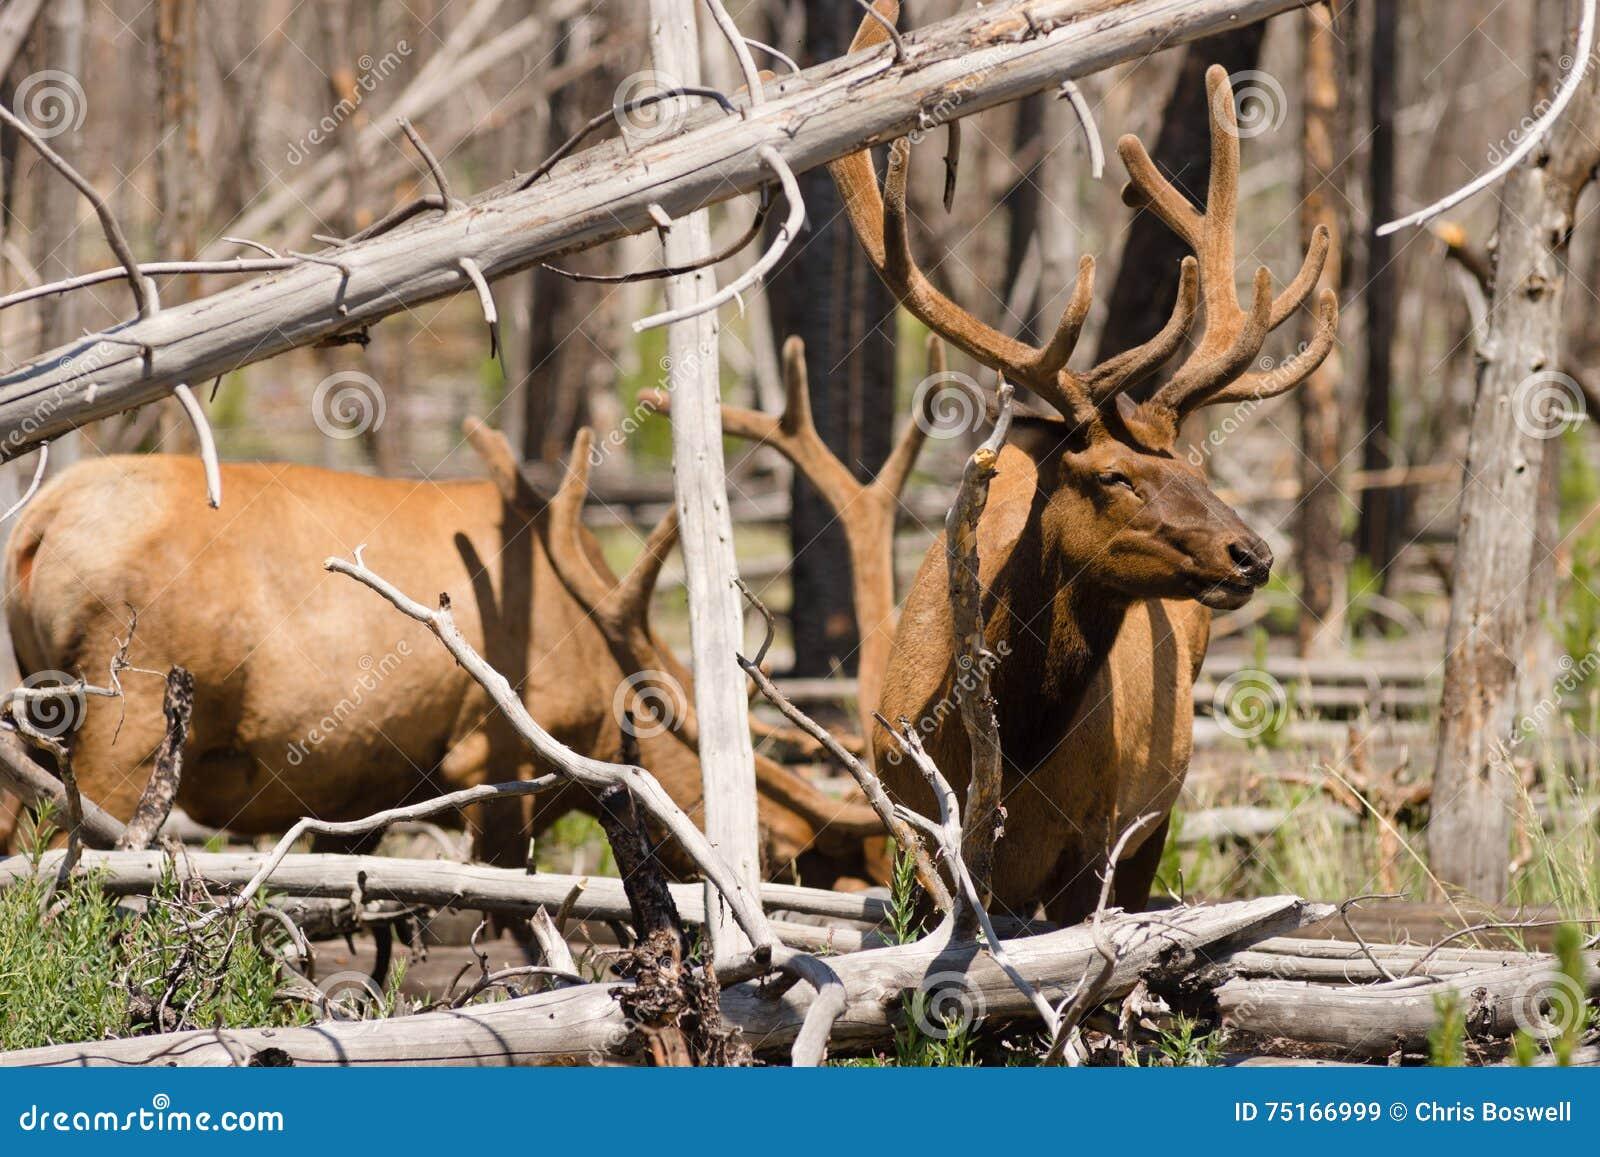 Large Bull Elk Western Animal Wildlife Yellowstone National Park